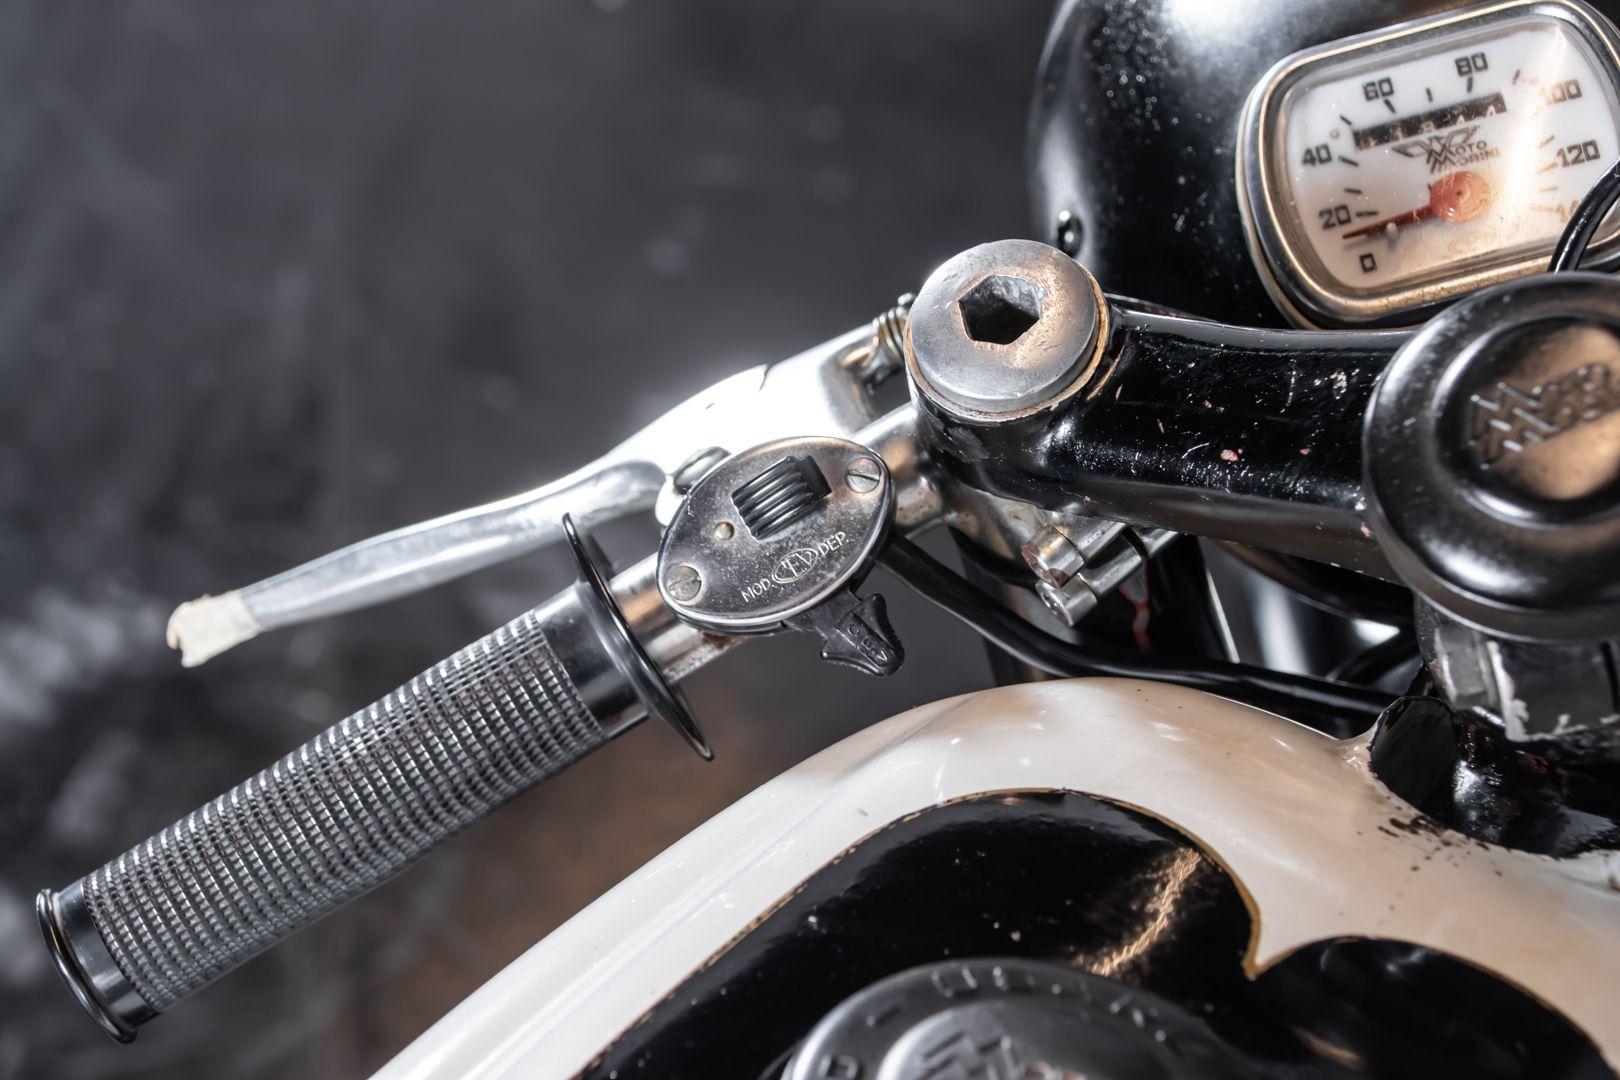 1960 Moto Morini Tresette Sprint 175 76481